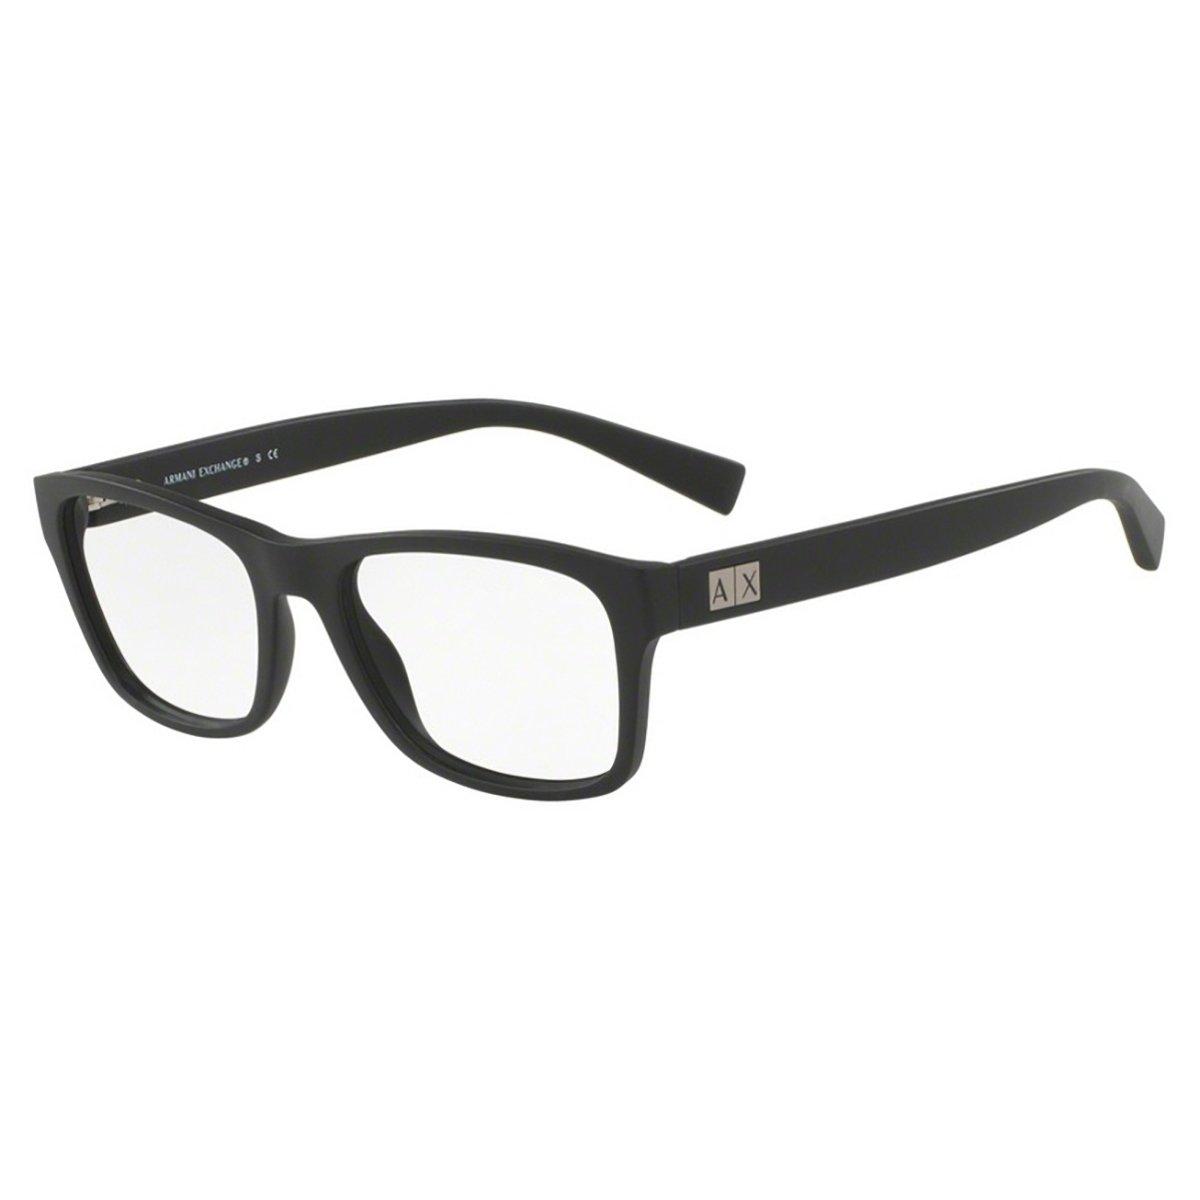 6baf19aec4b Compre Óculos de Grau Armani Exchange em 10X